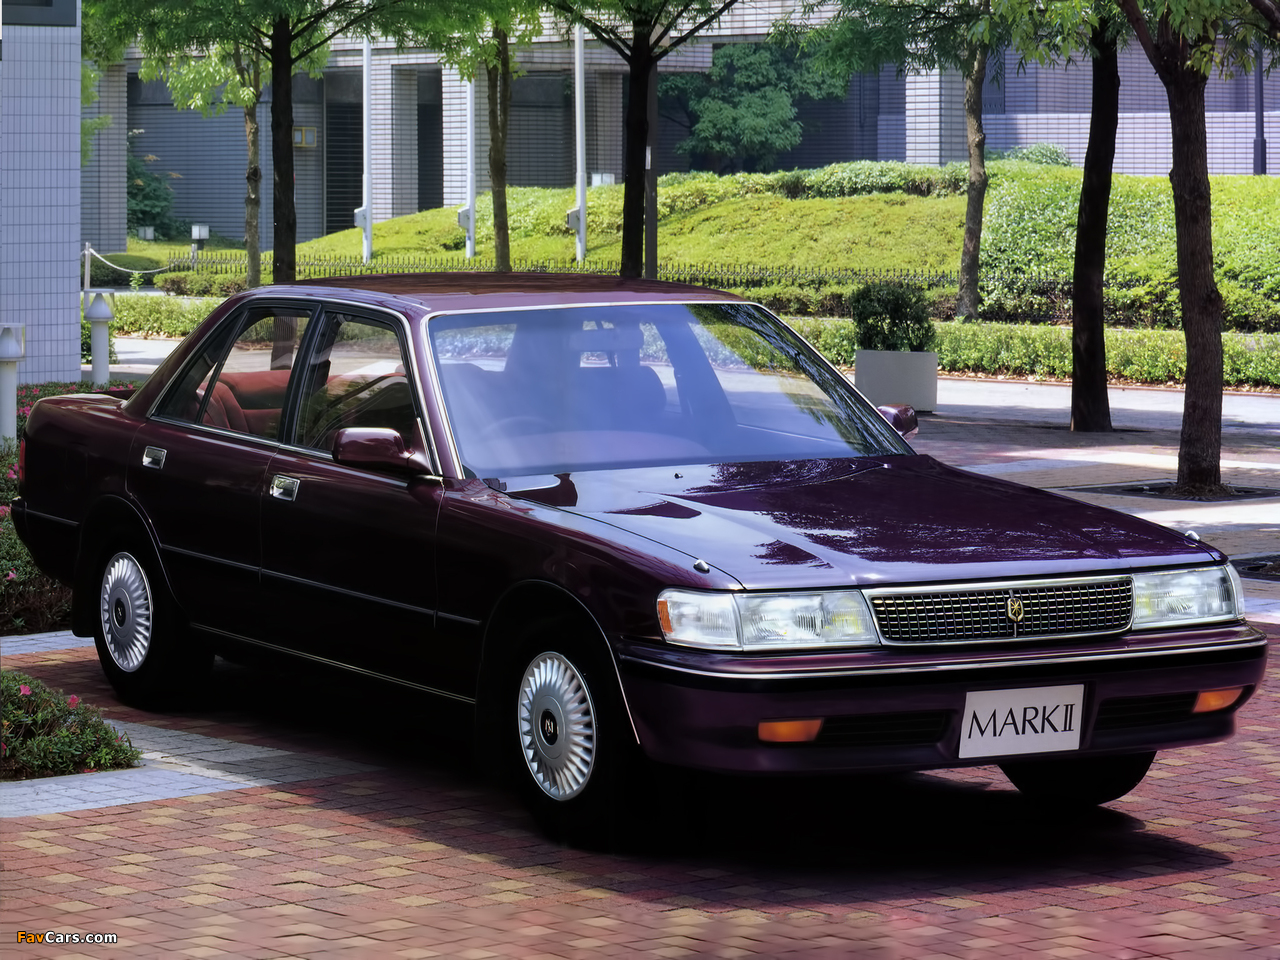 Toyota Mark Ii Sedan X80 1988 96 Wallpapers 1280x960